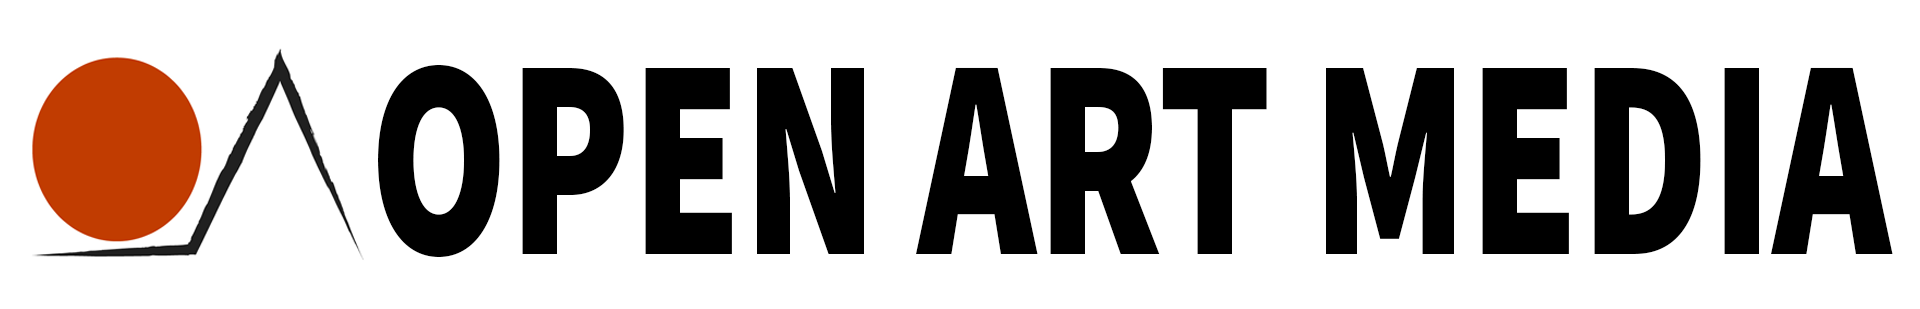 Open Art Media